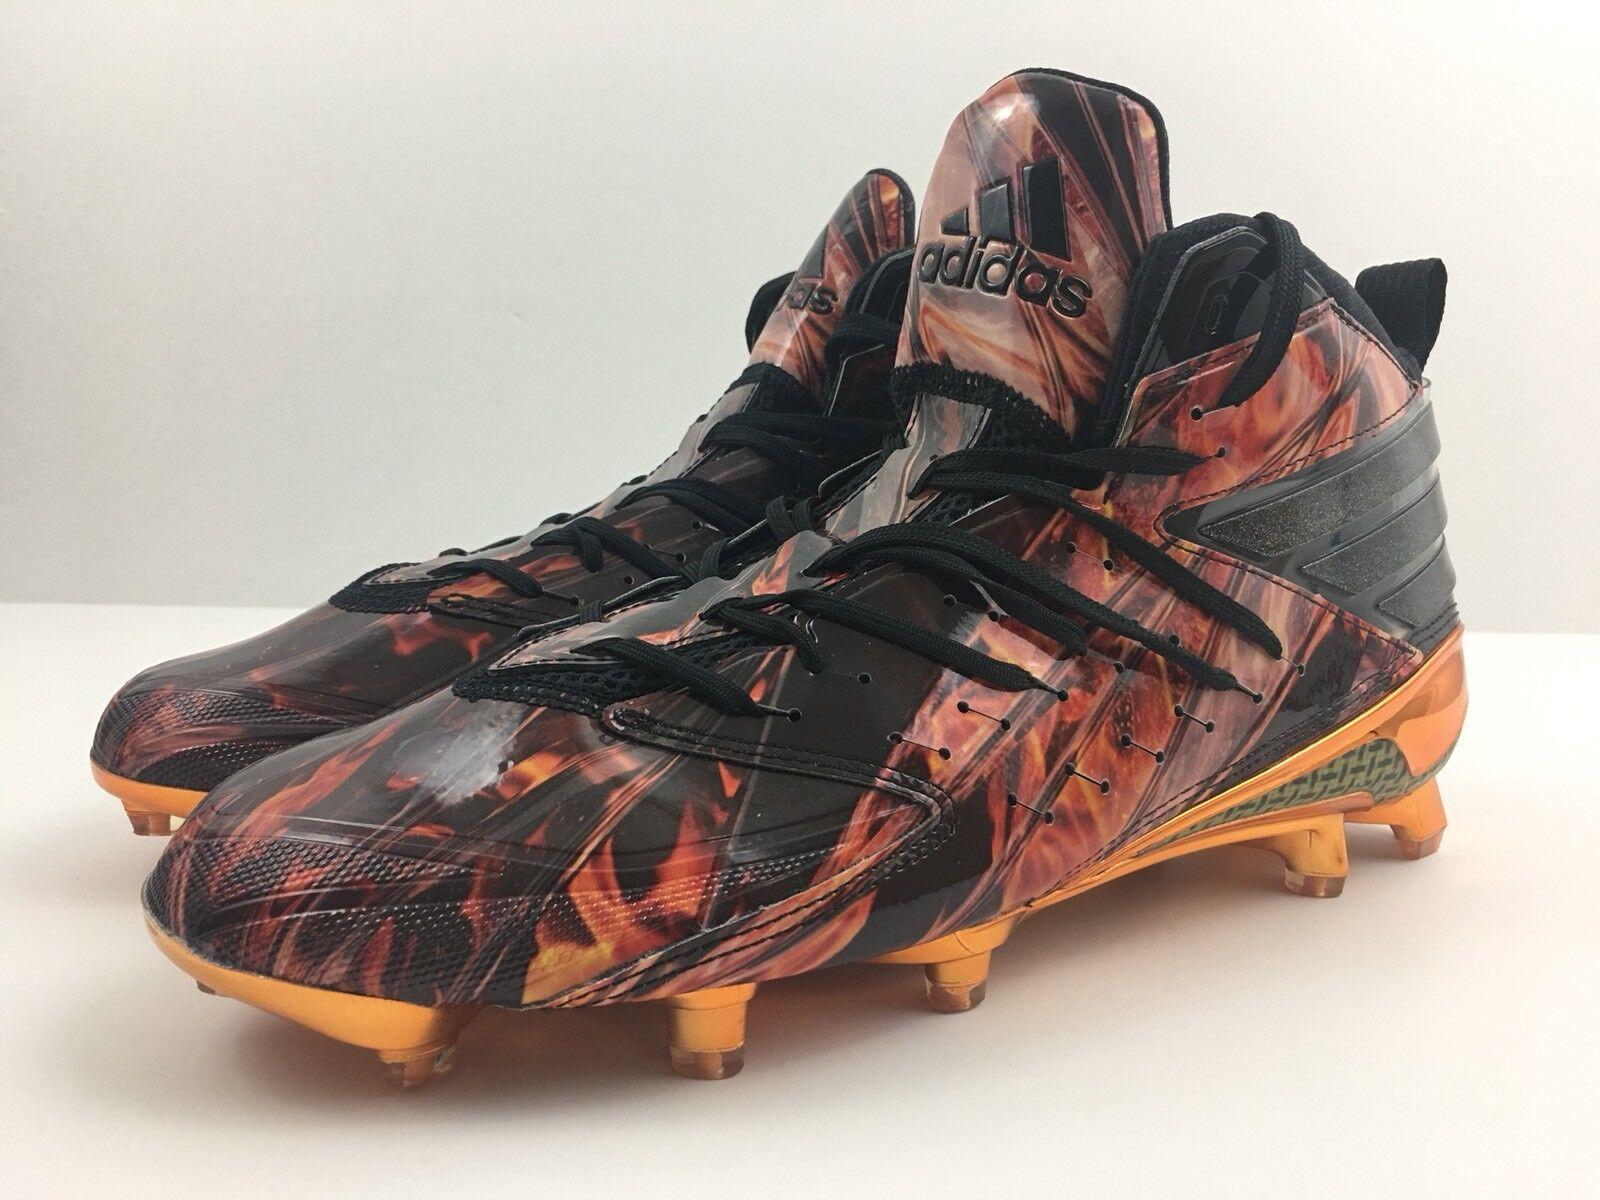 adidas monstre crampons x kevlar flammes noires du cuivre aq6840 crampons monstre hommes taille 11 17dc9e